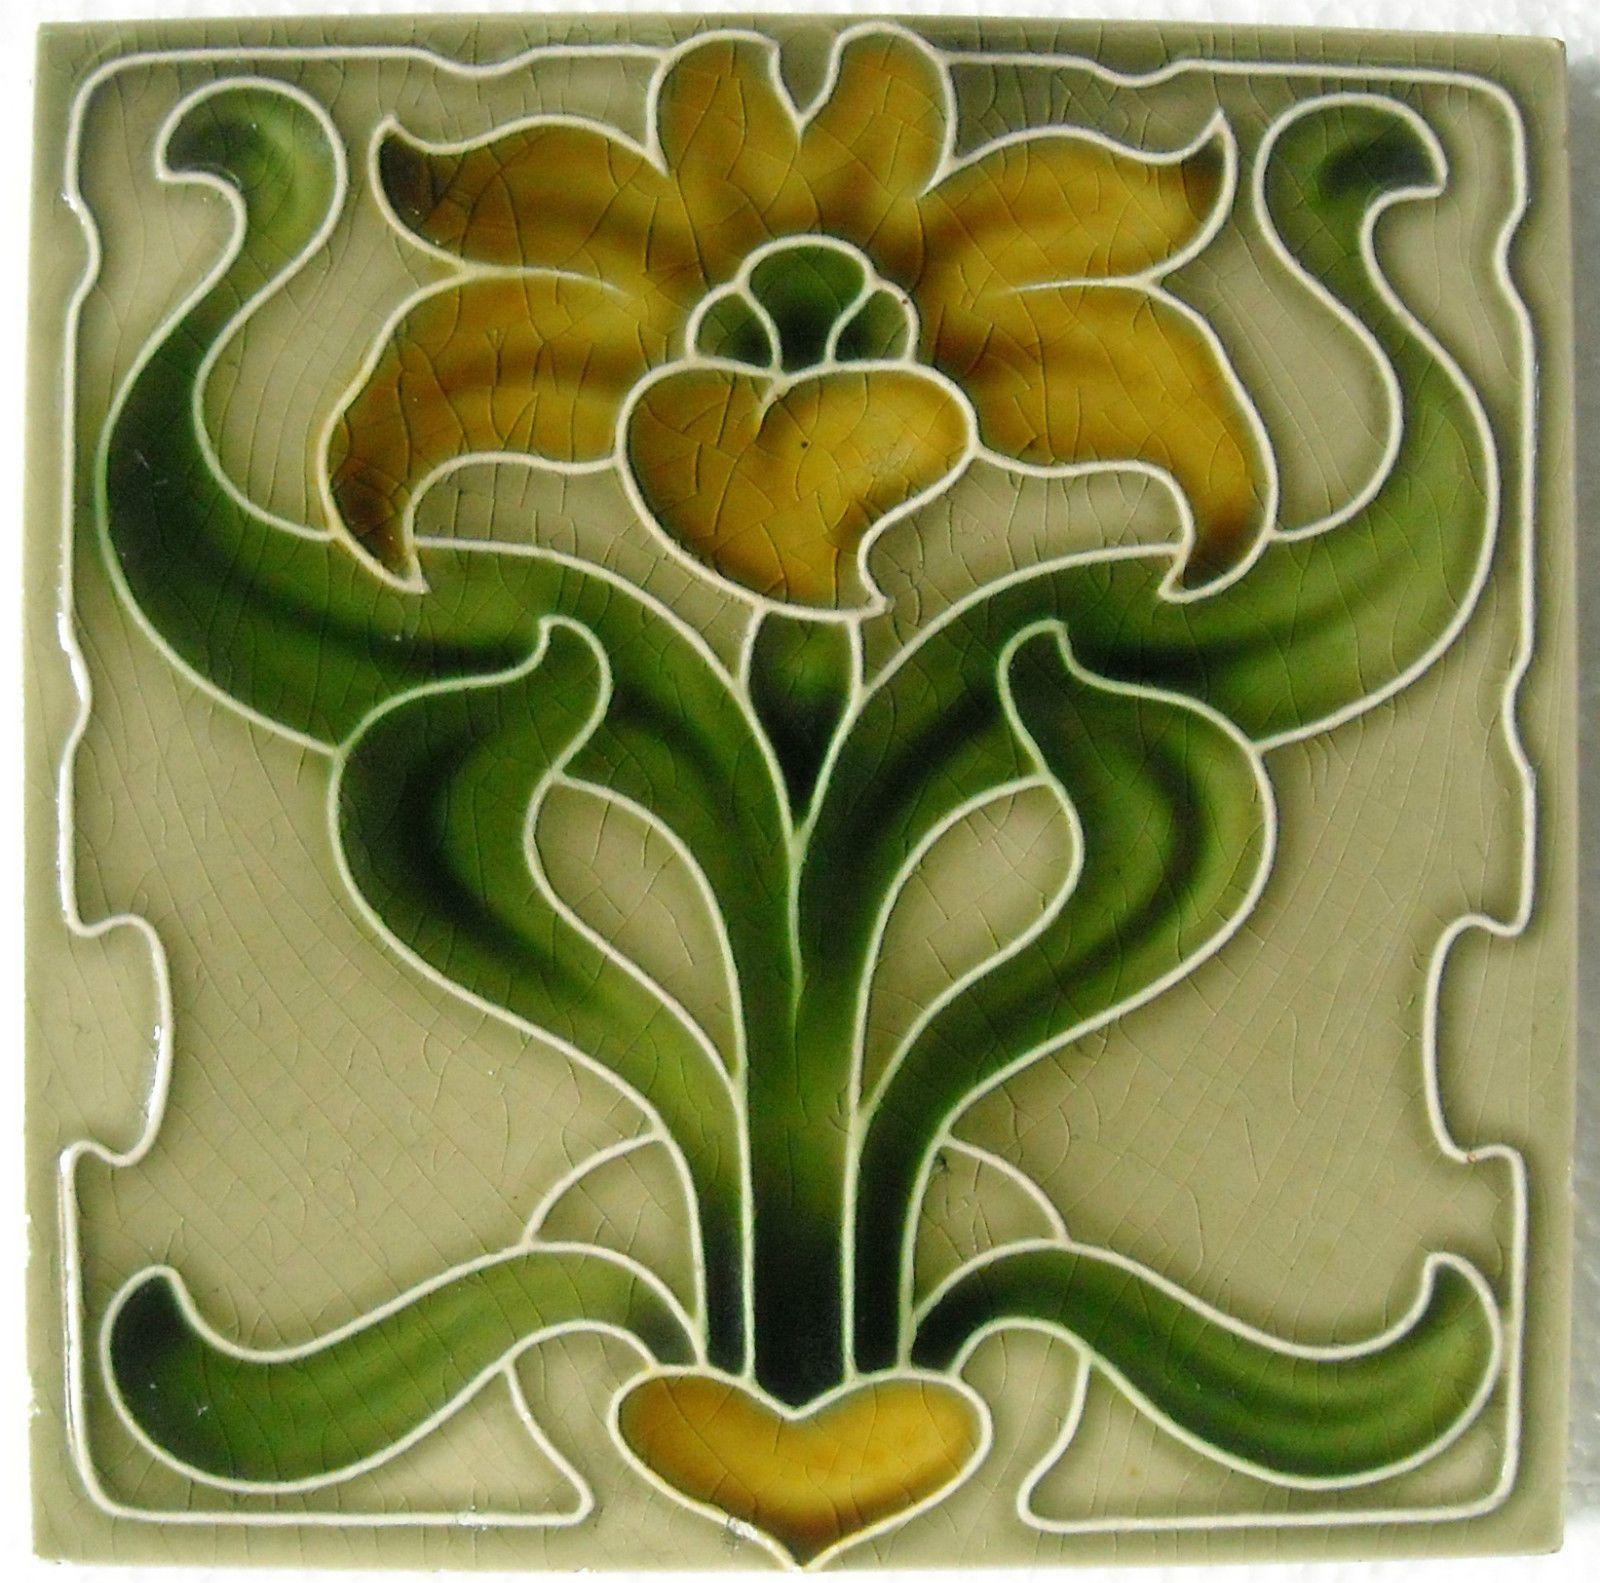 England antique art nouveau majolica tile c1900 ebay 406 art art nouveau ceramic decorative wall tile 6 x 6 inches dailygadgetfo Choice Image